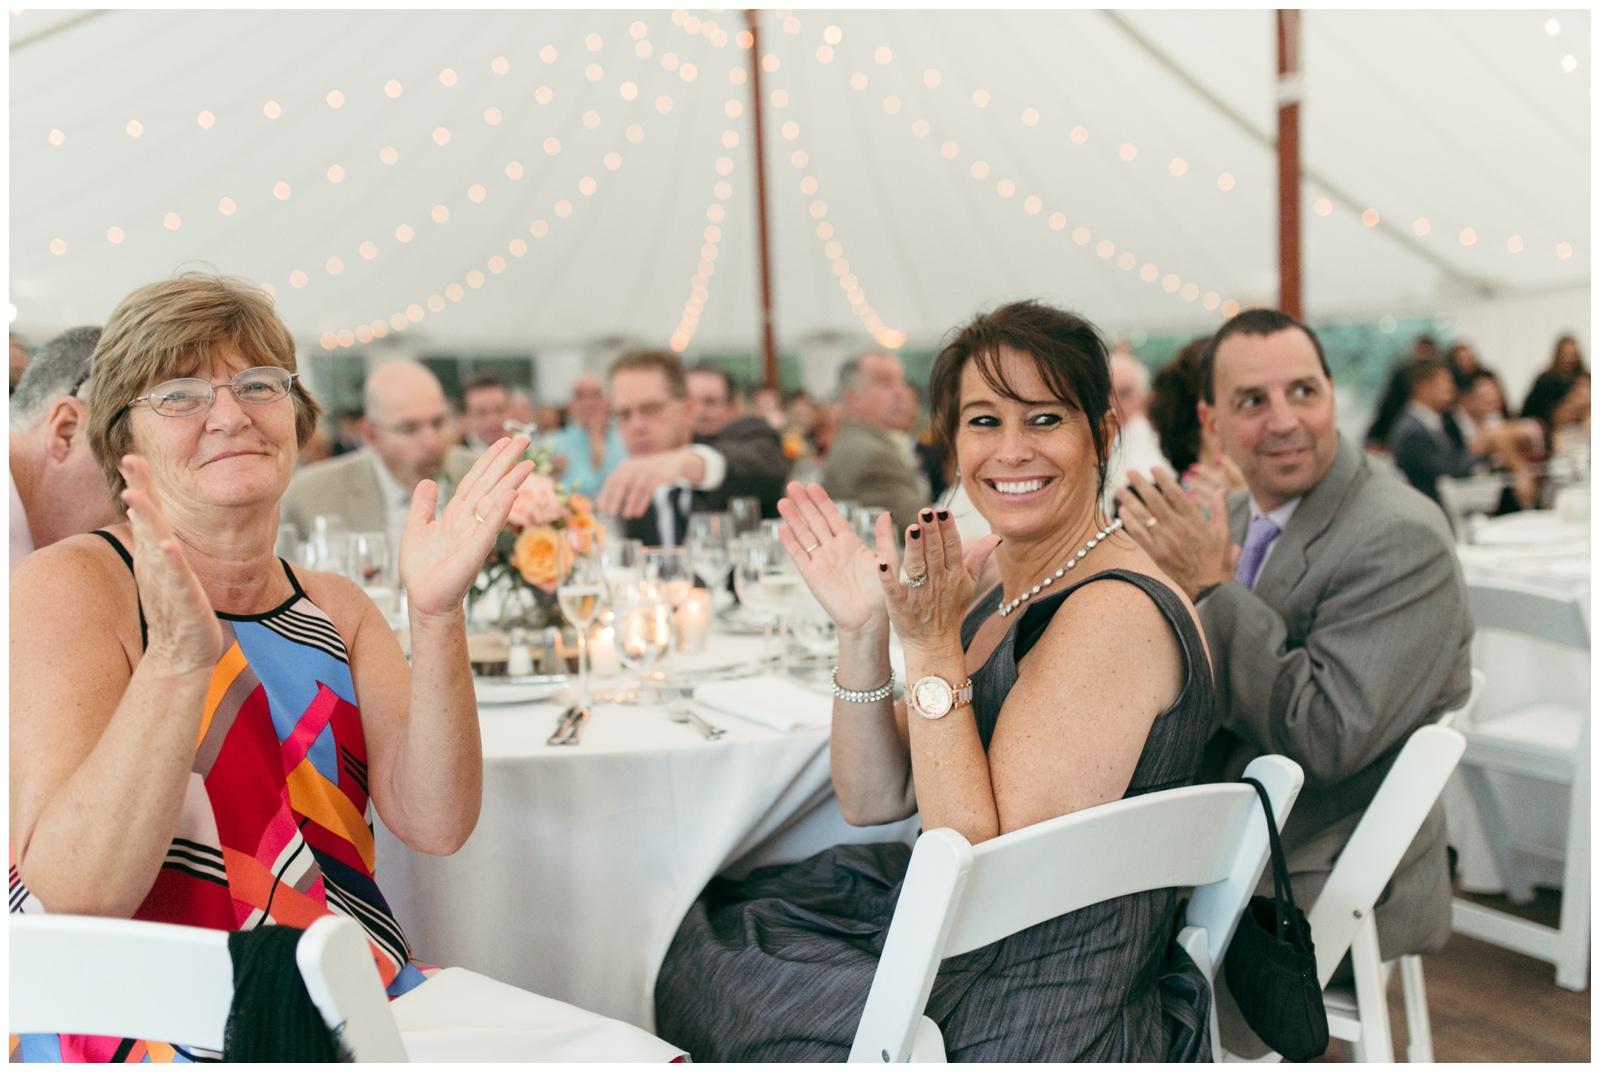 Moraine-Farm-wedding-Bailey-Q-Photo-Massachusetts-wedding-photpgrapher-111.jpg